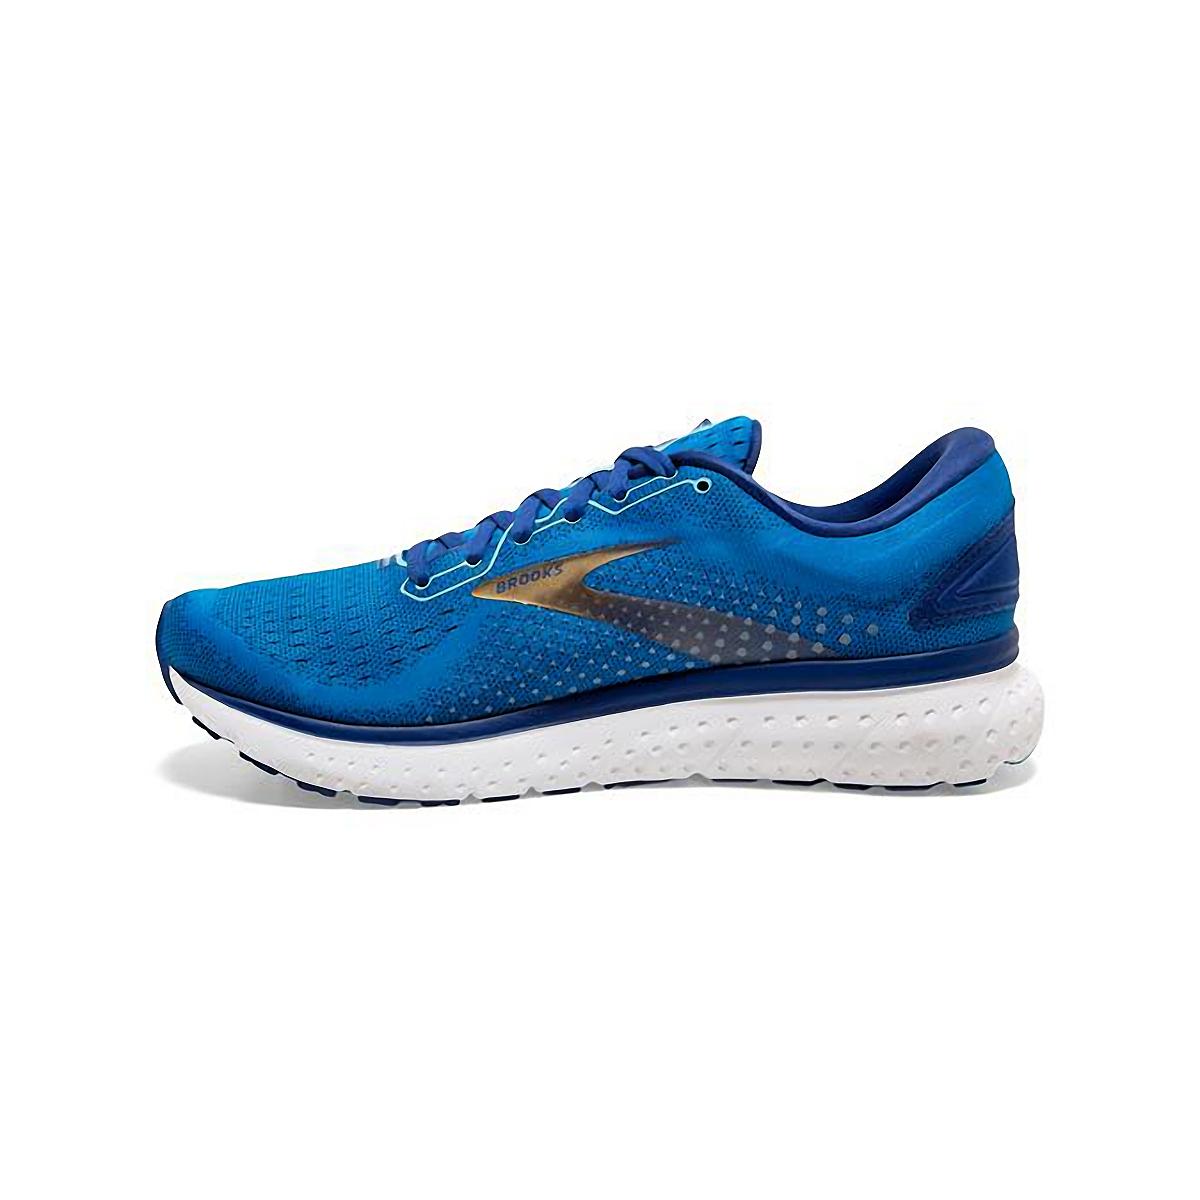 Men's Brooks Glycerin 18 Running Shoe - Color: Blue/Marazine/Gold - Size: 7 - Width: Regular, Blue/Marazine/Gold, large, image 2